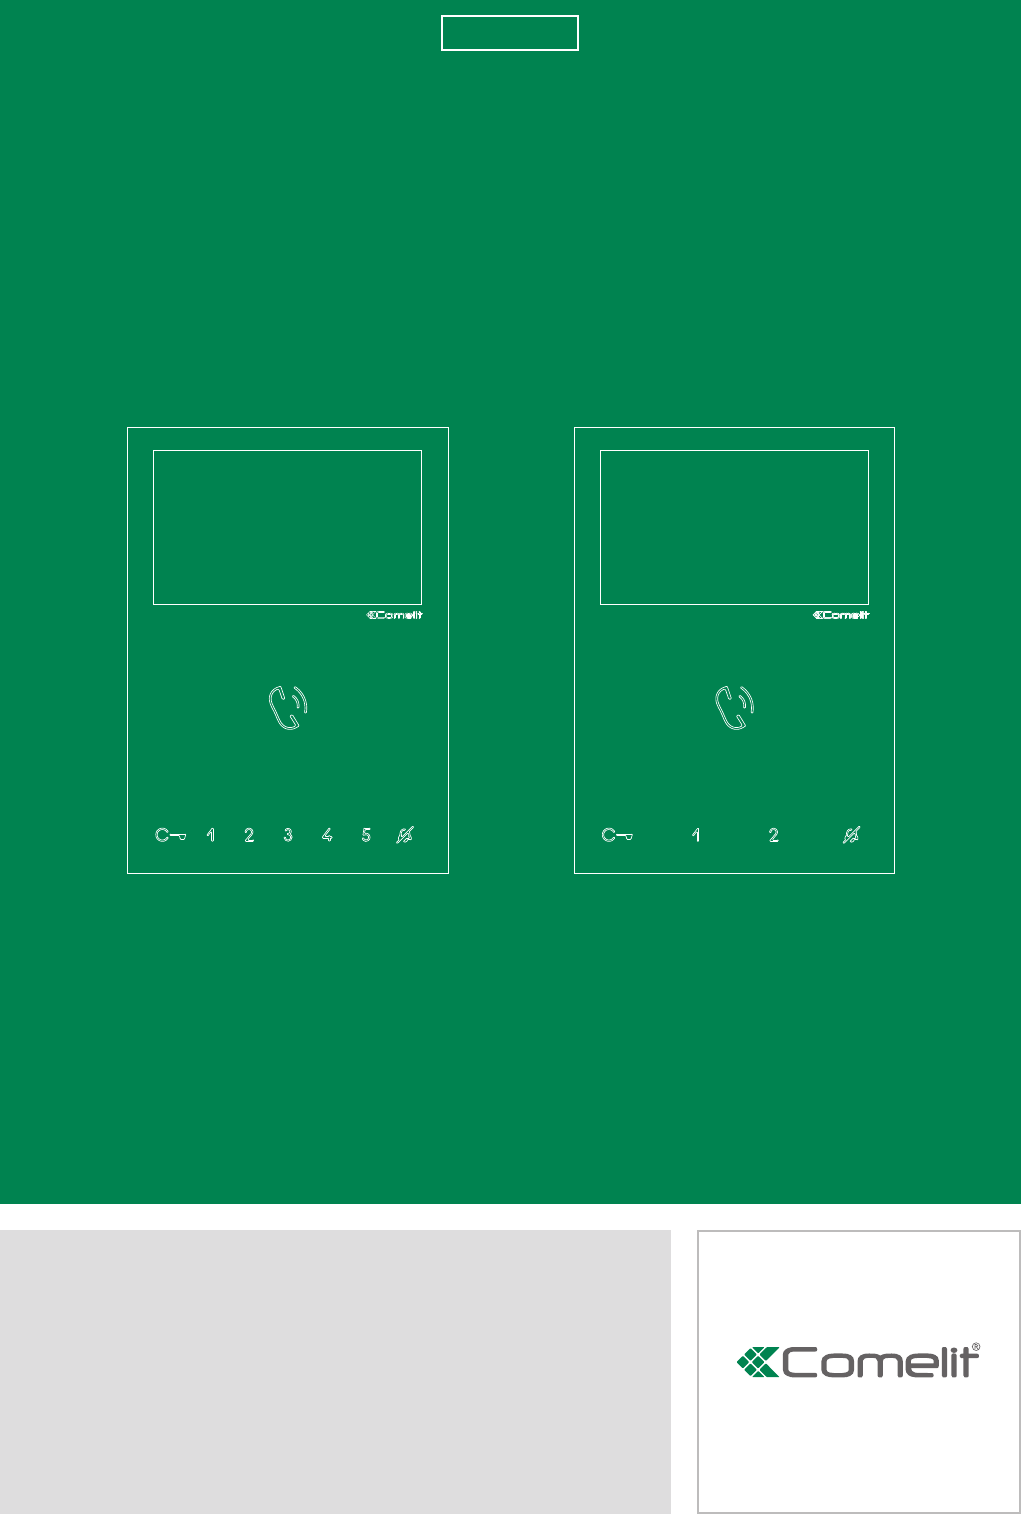 6721w manual comelit user